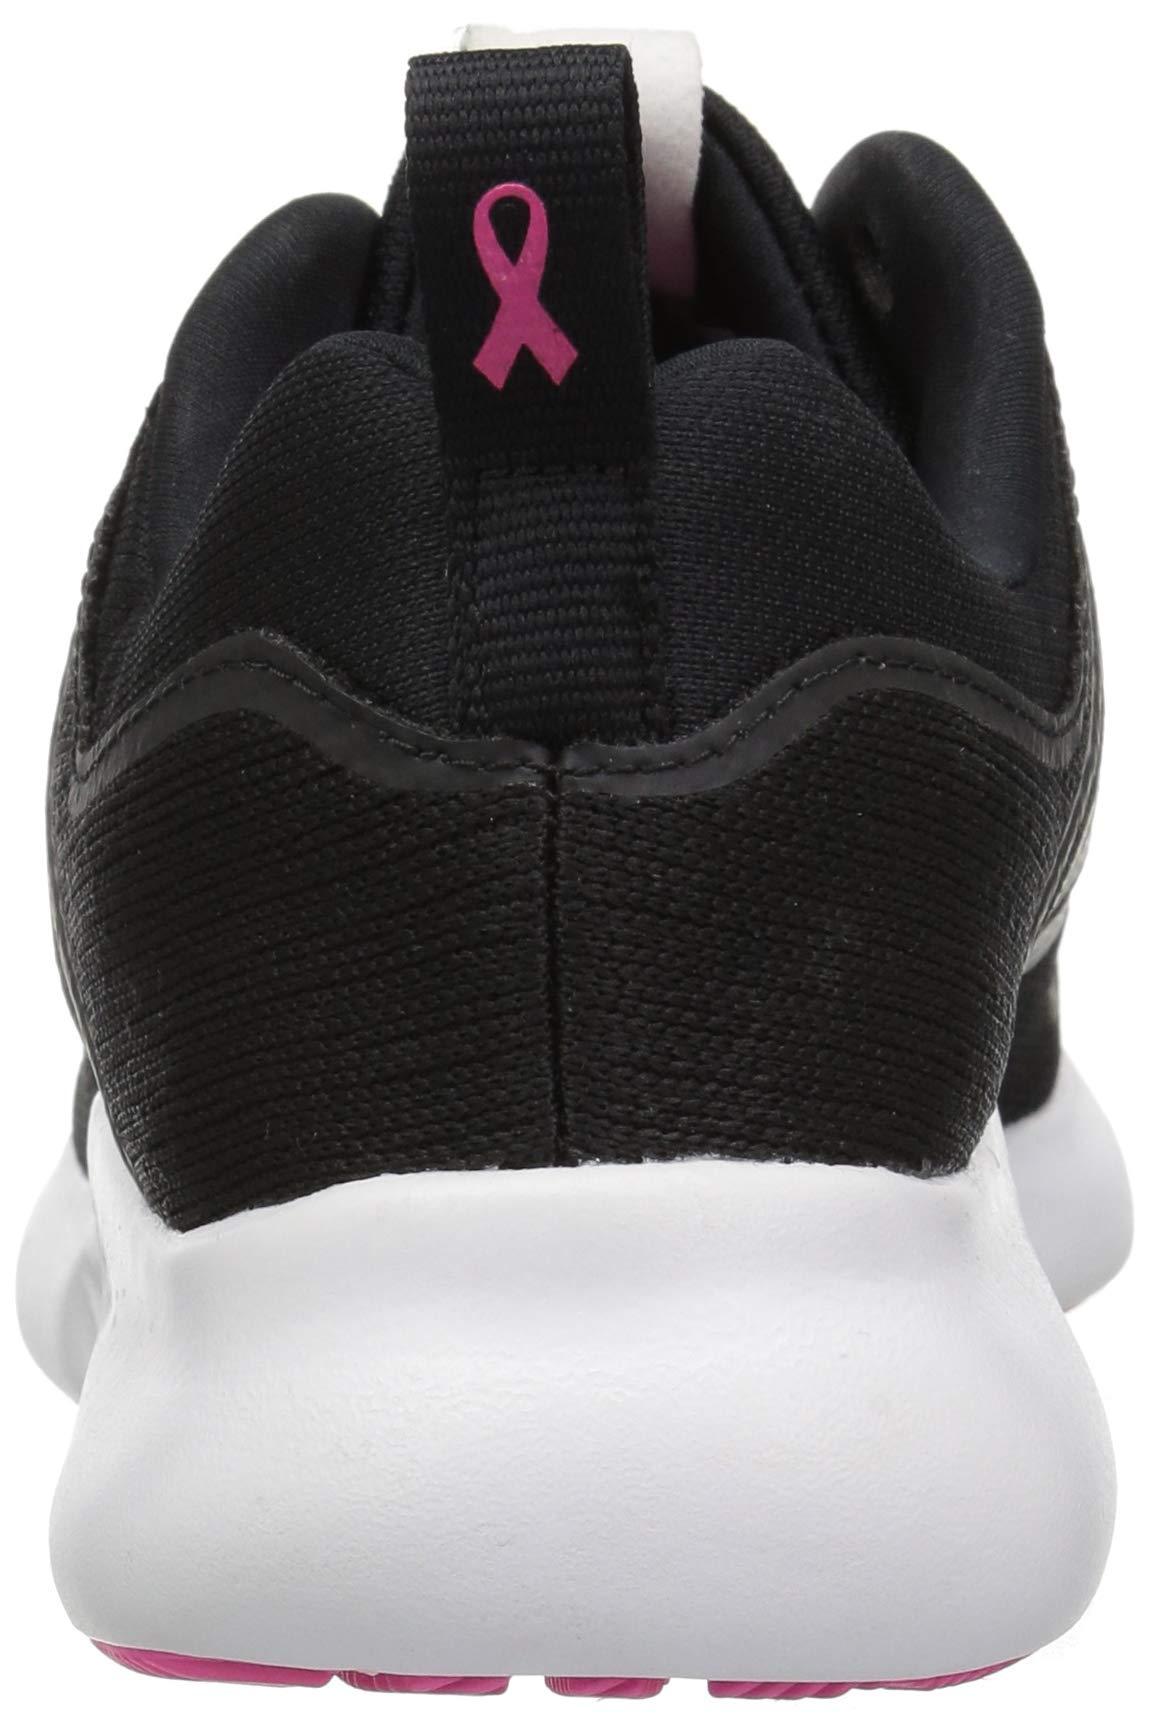 adidas Women's EdgeBounce Running Shoe, Black/Silver Metallic/Shock Pink, 5 M US by adidas (Image #2)